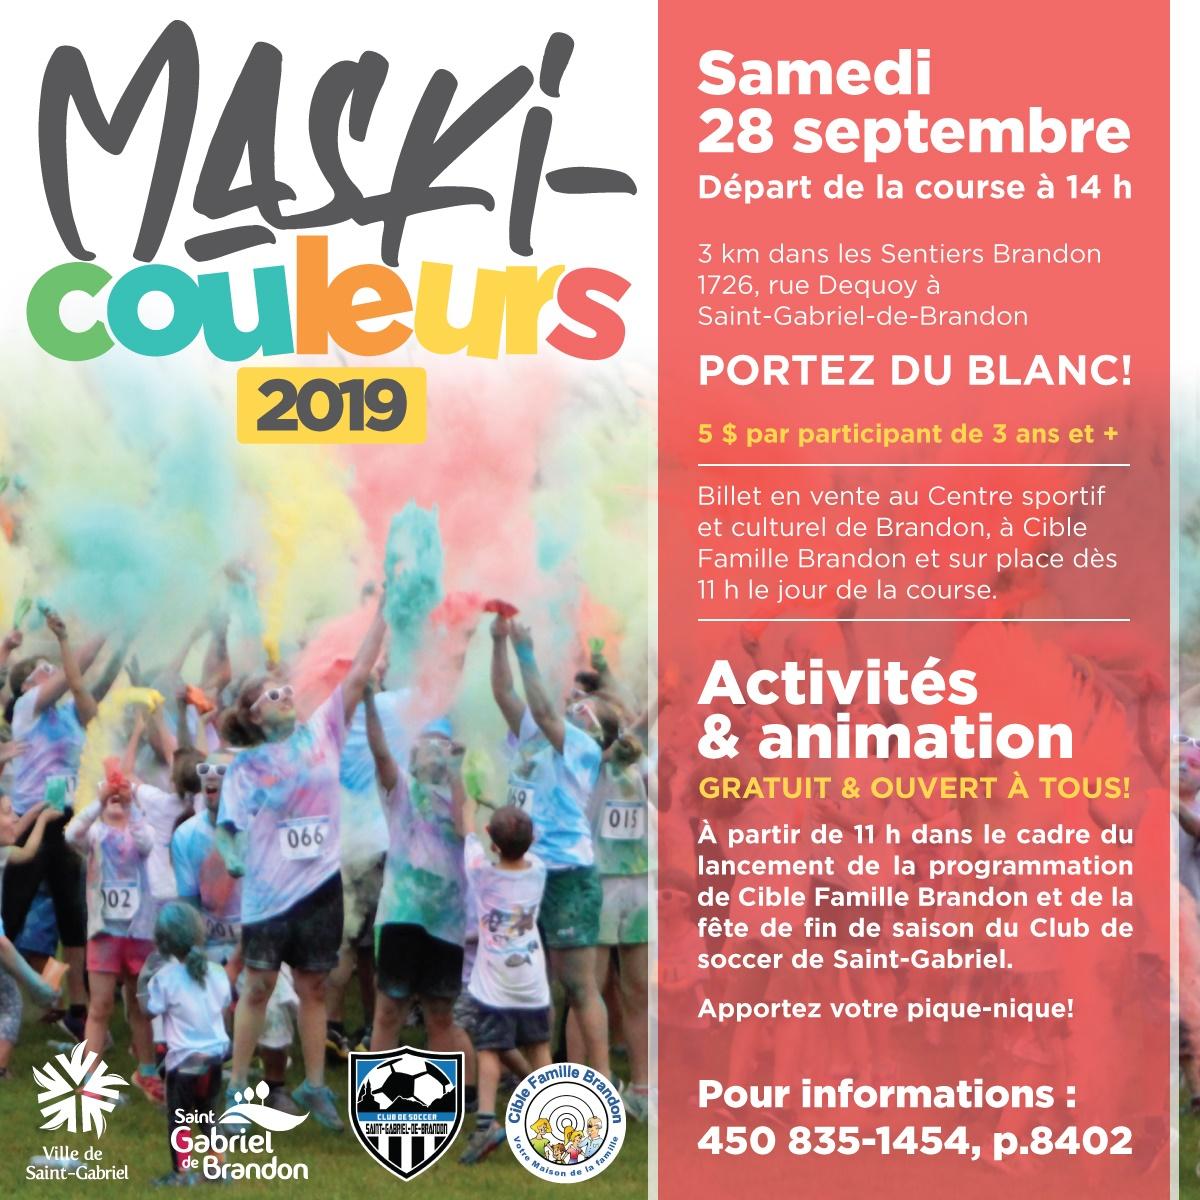 Maski-Couleurs 2019.jpg